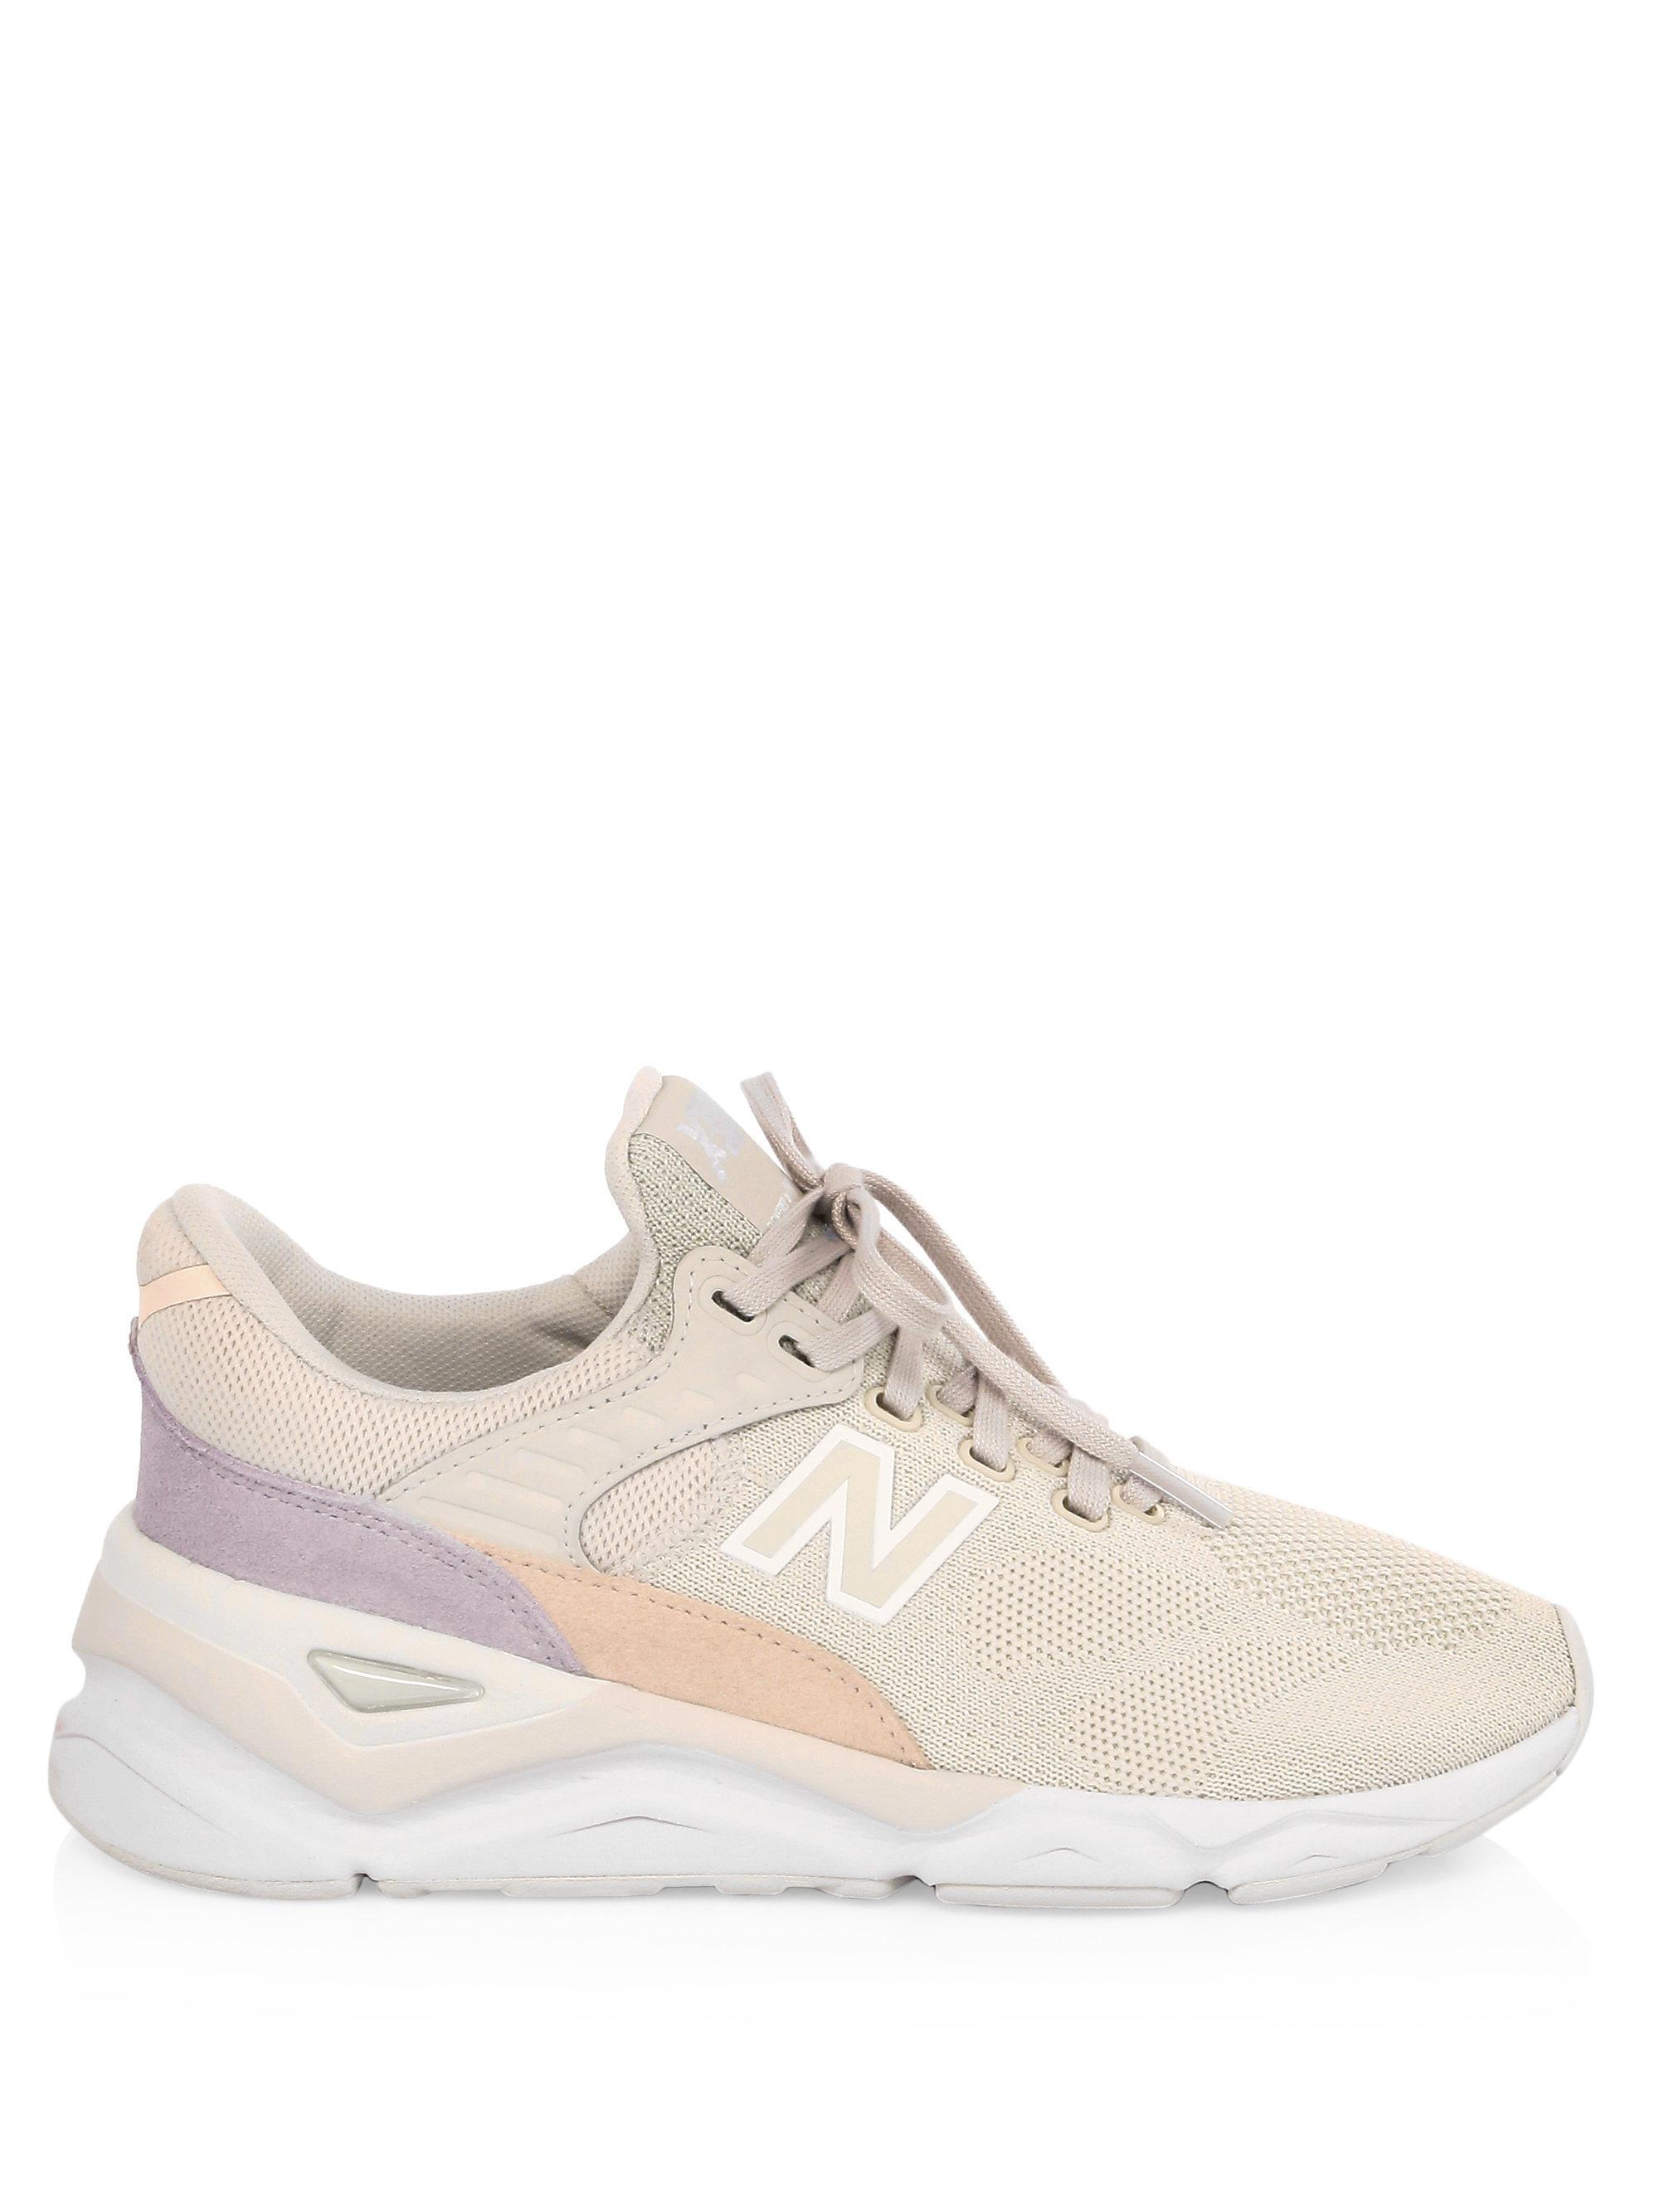 New Balance Moonbeam X90 Suede Mesh Sneakers Lyst